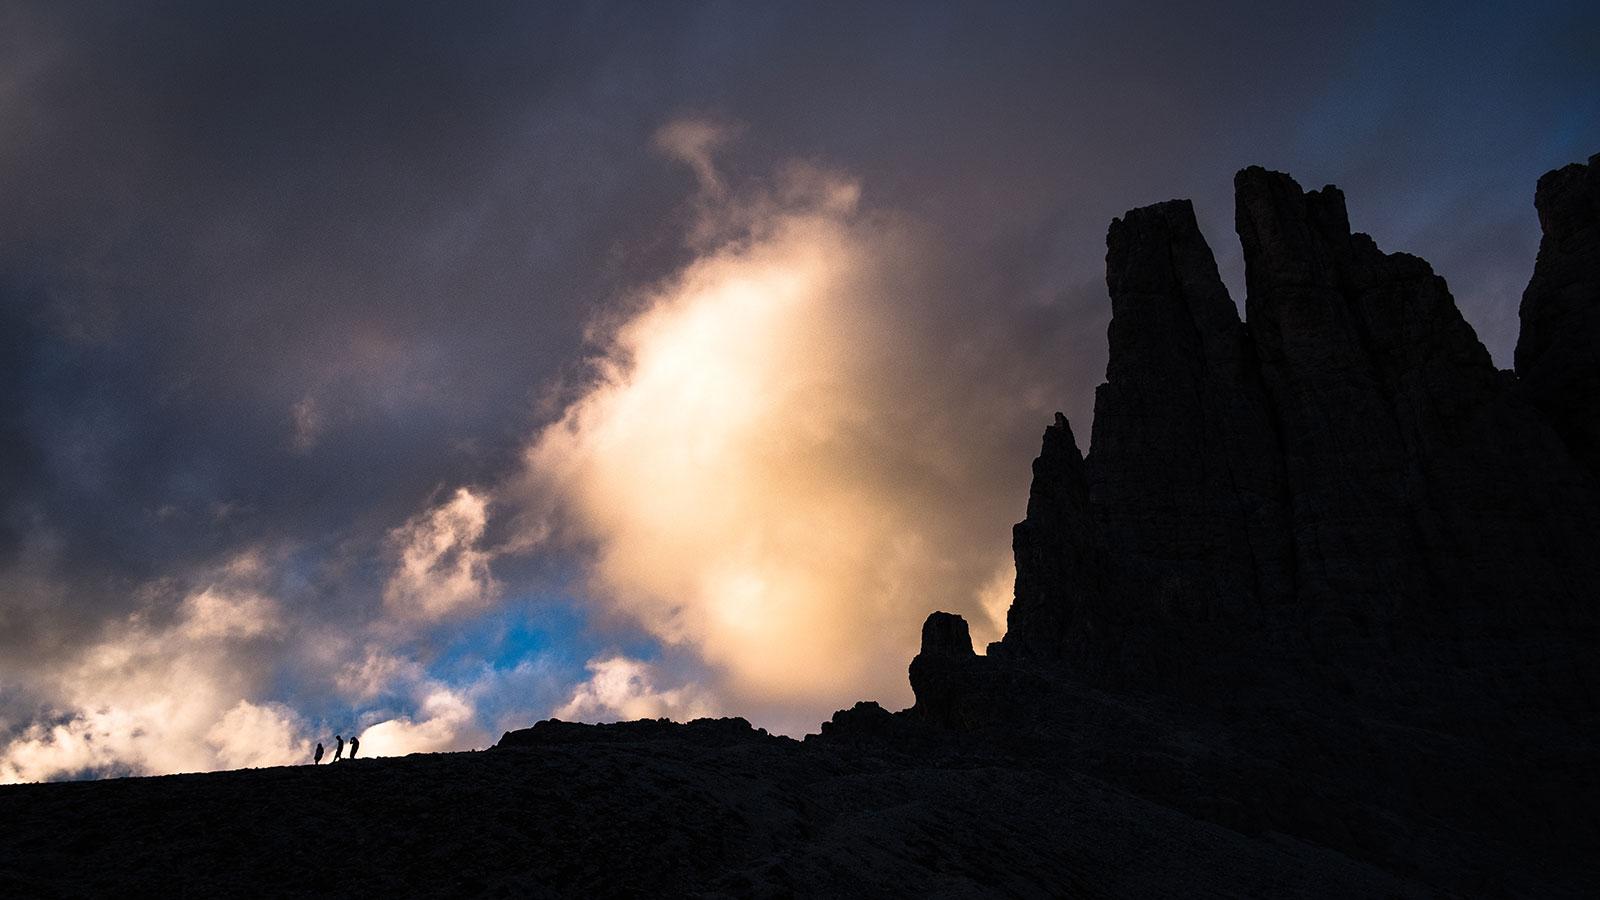 Abstieg. Vajolet, Dolomiten | Pauli Trenkwalder, Berge & Psychologie